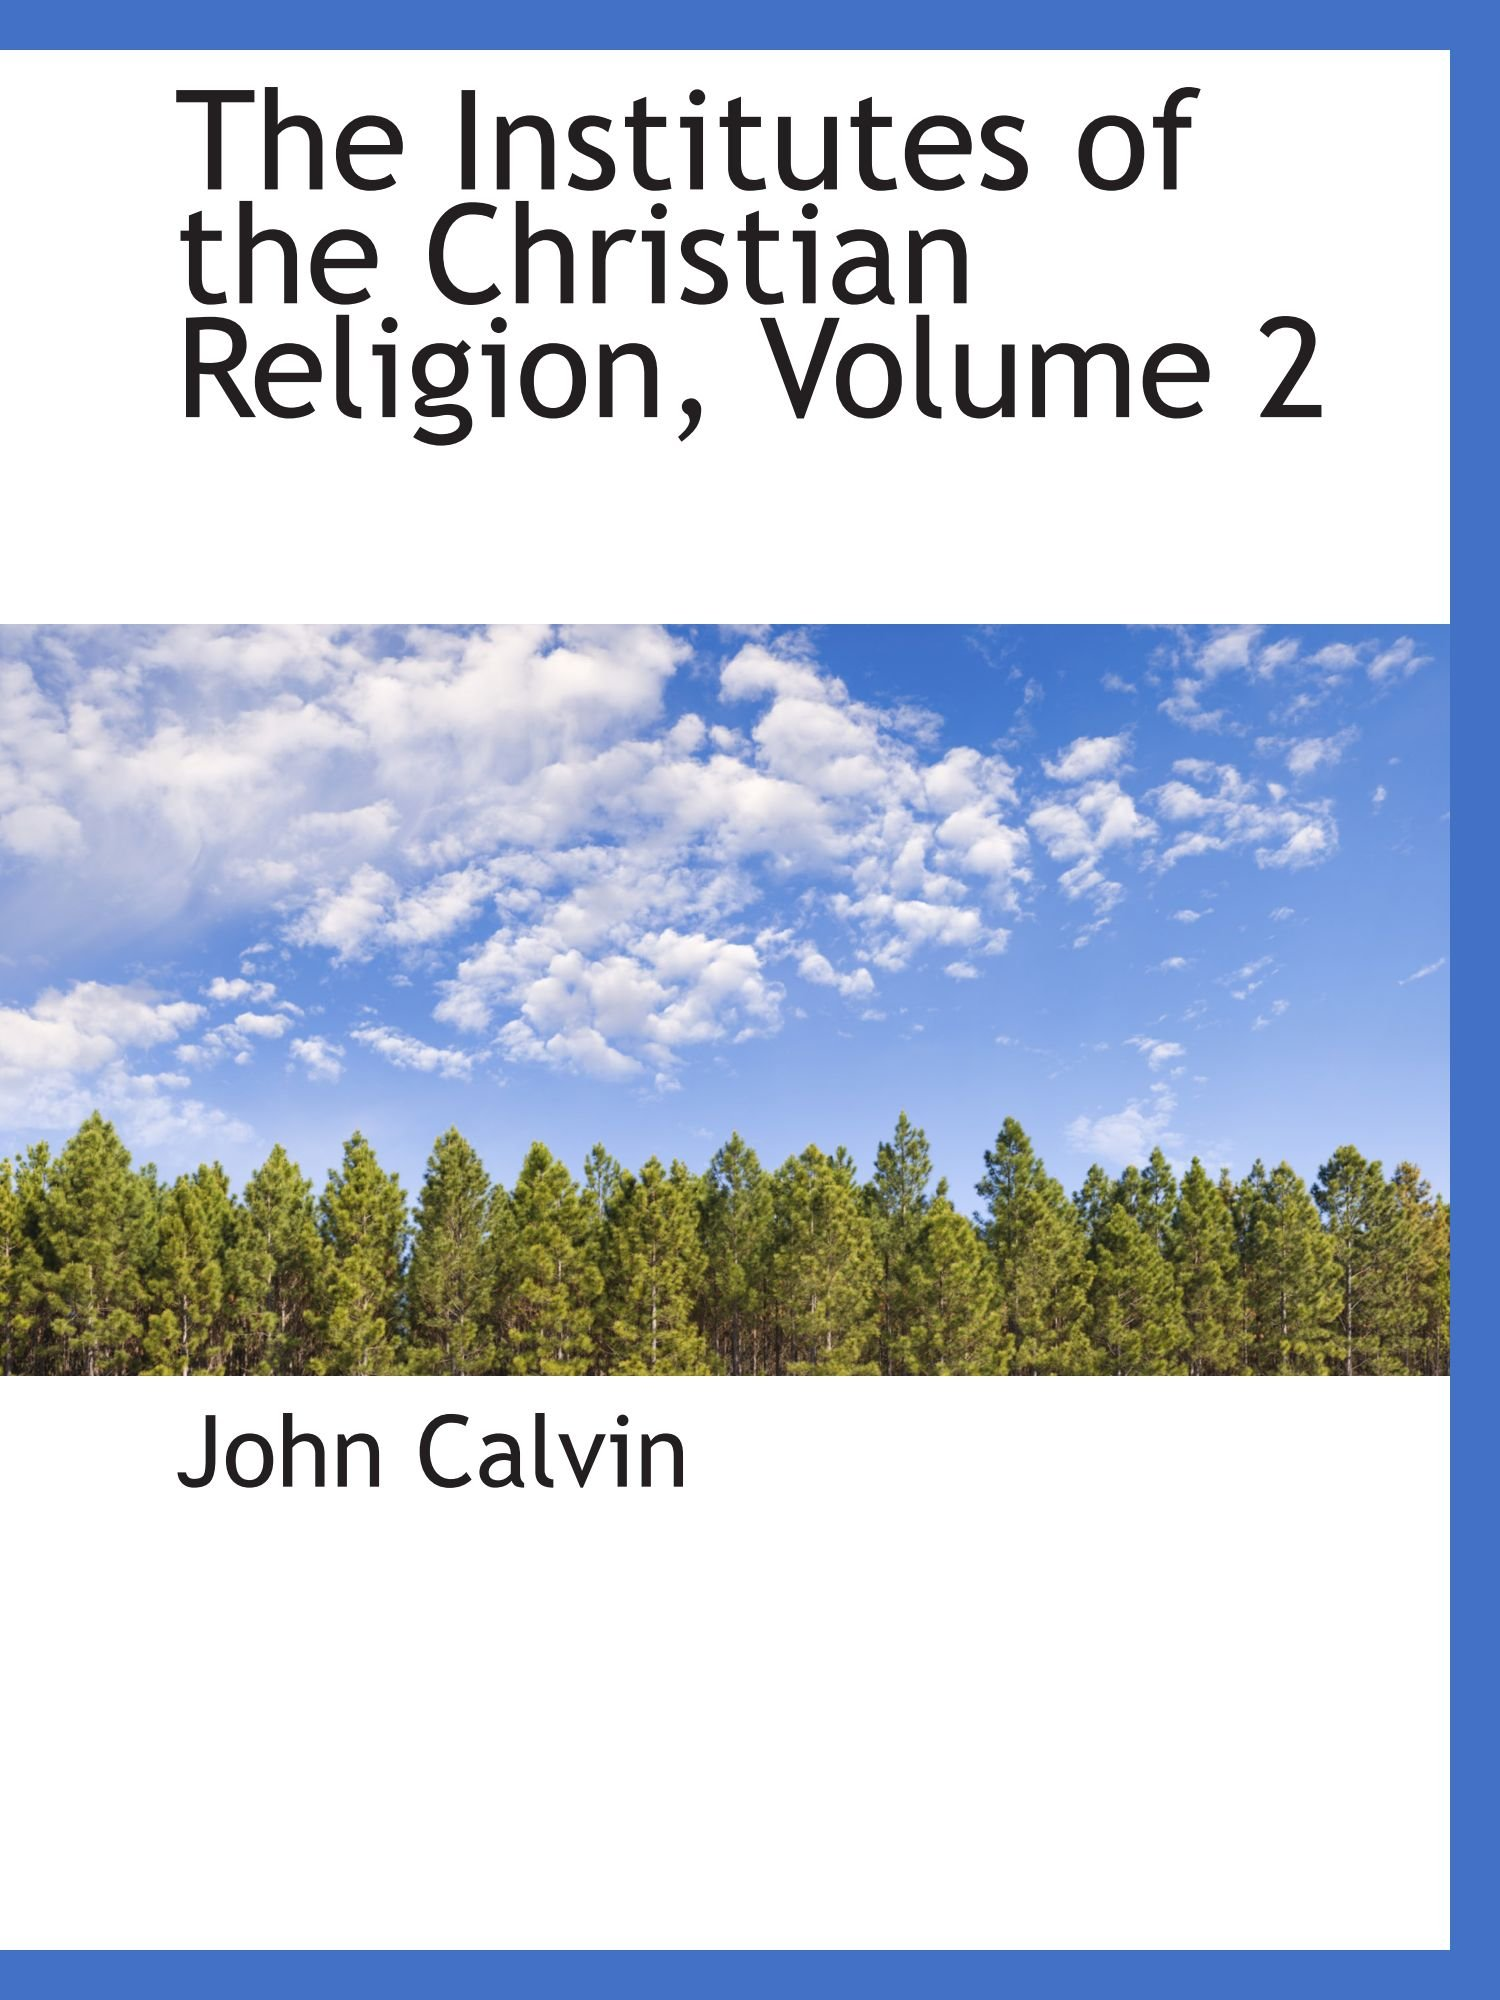 The Institutes of the Christian Religion, Volume 2 PDF